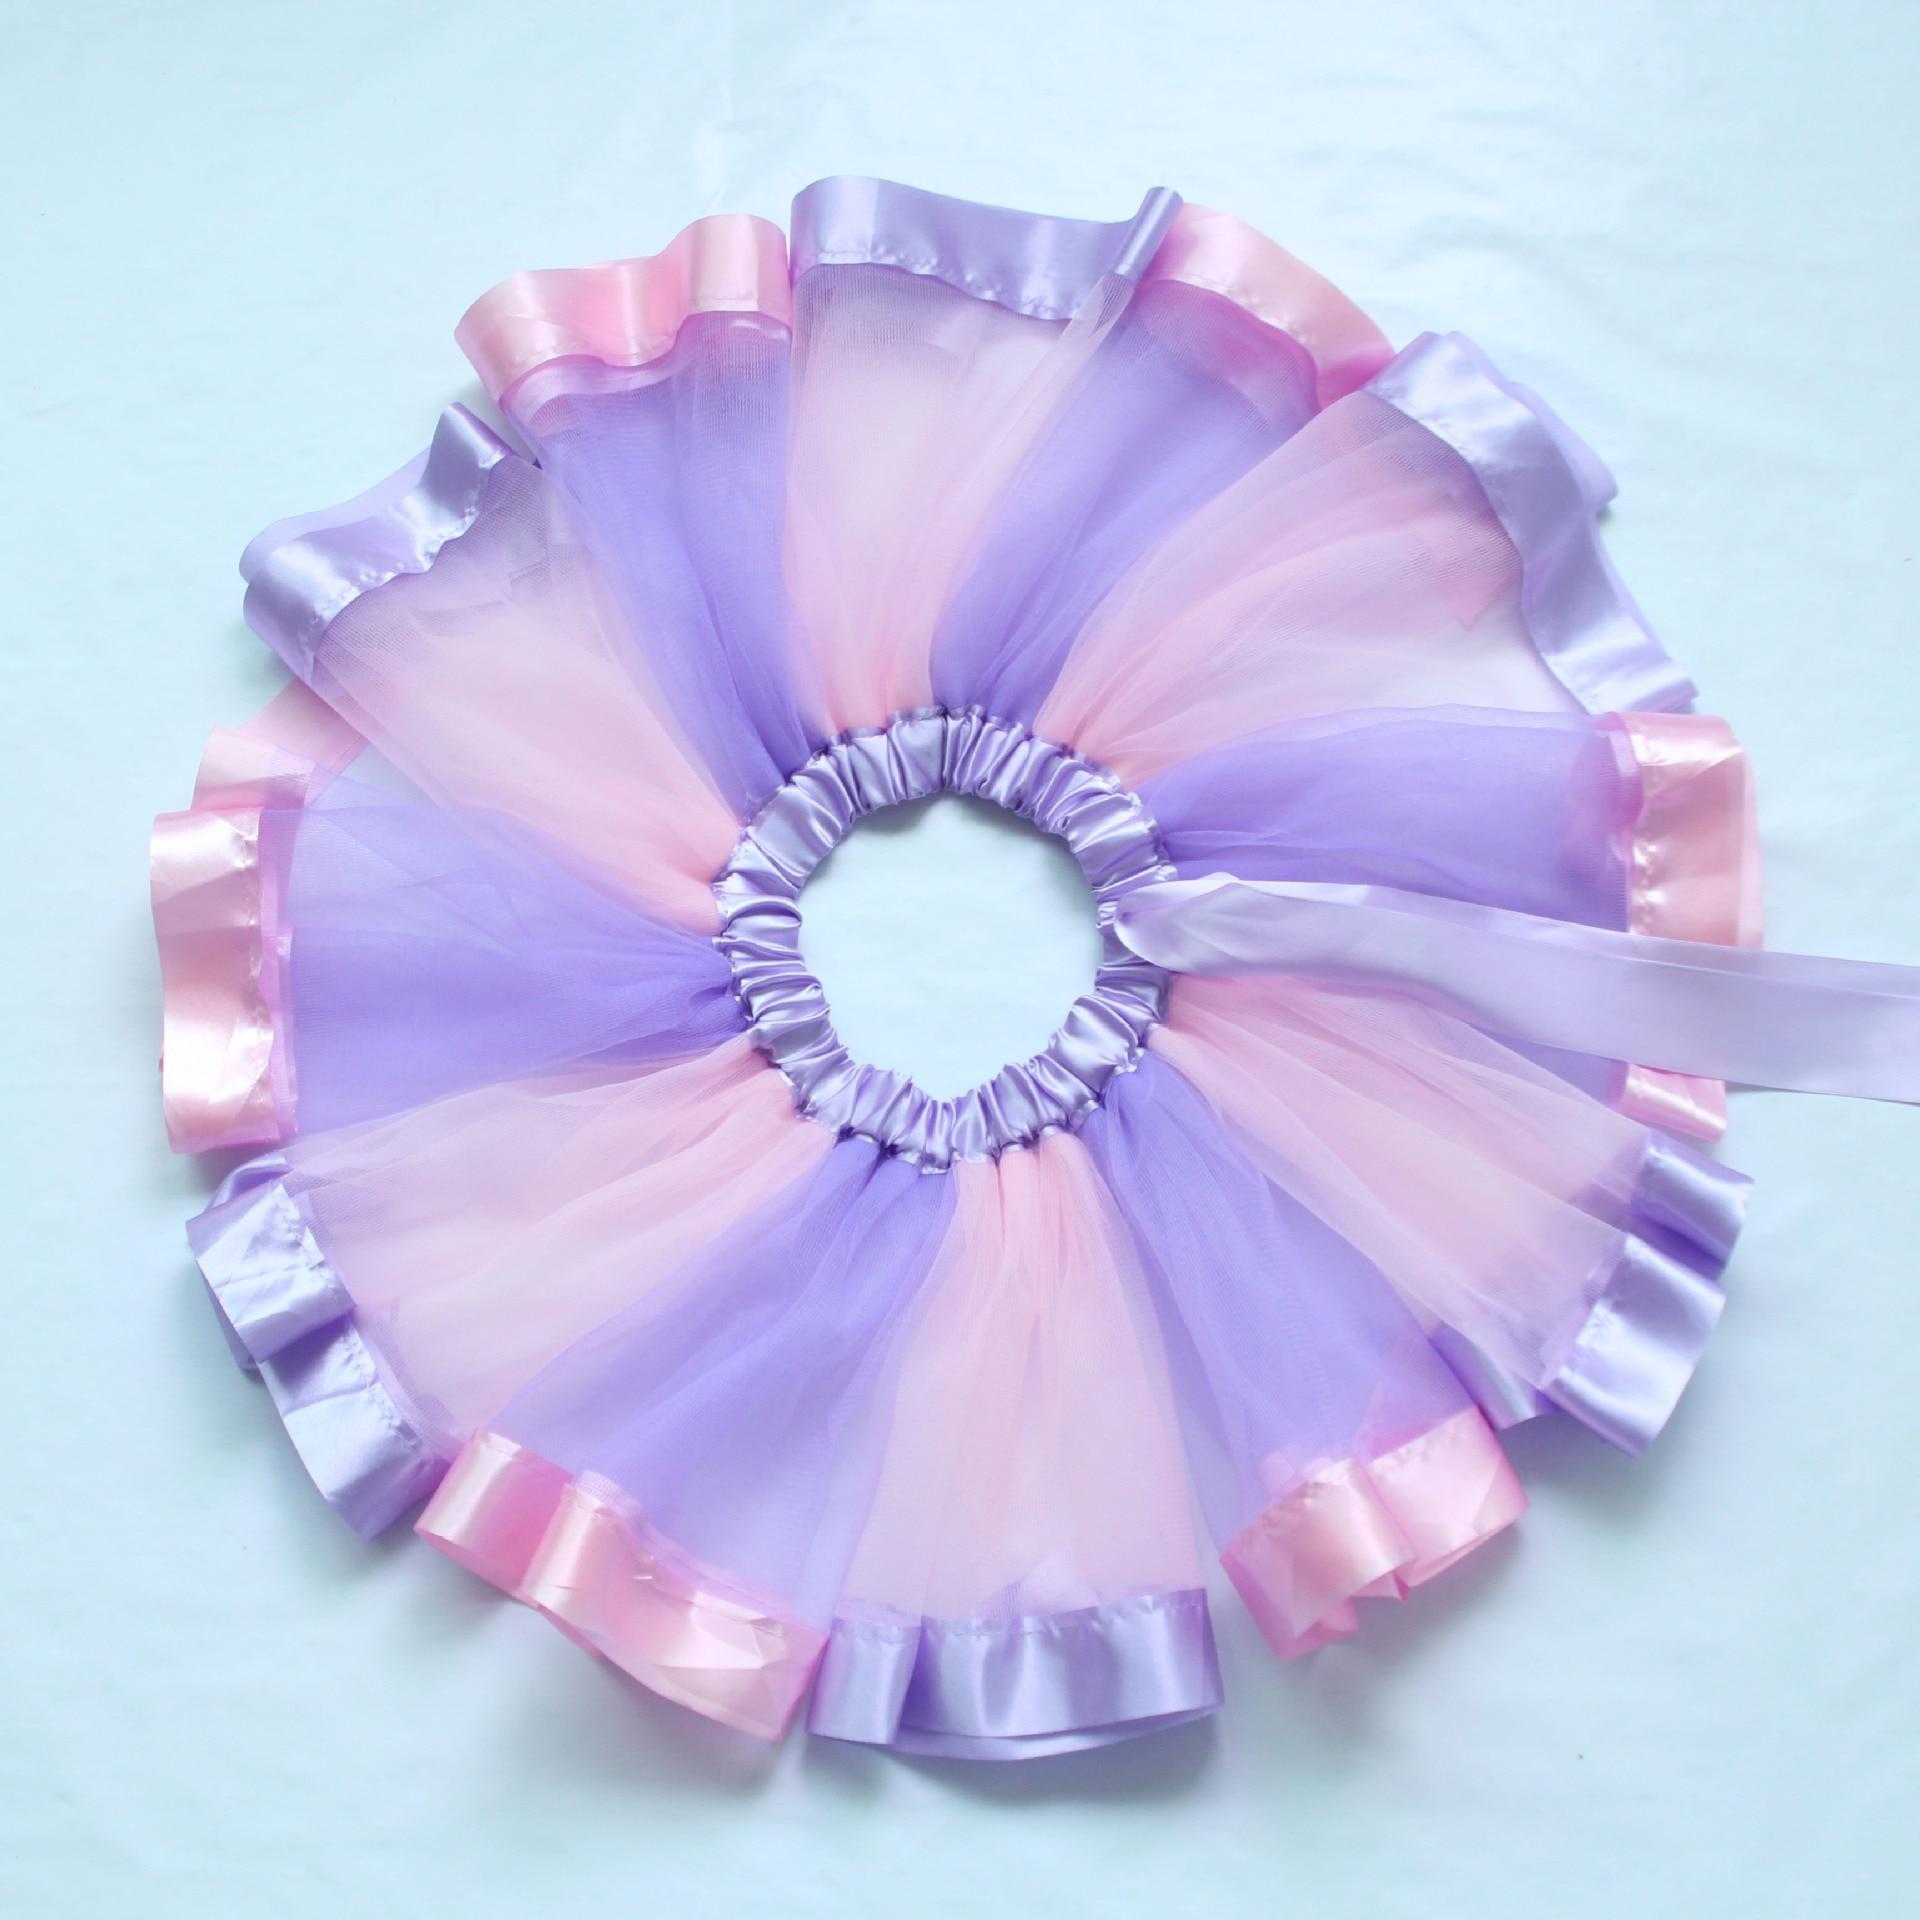 Girls Pettiskirt Baby DIY Tutu Net Yarn Skirts Pink Purple Tulle Puffy Skirts Toddler/infant Short Cake Skirt Children Princess